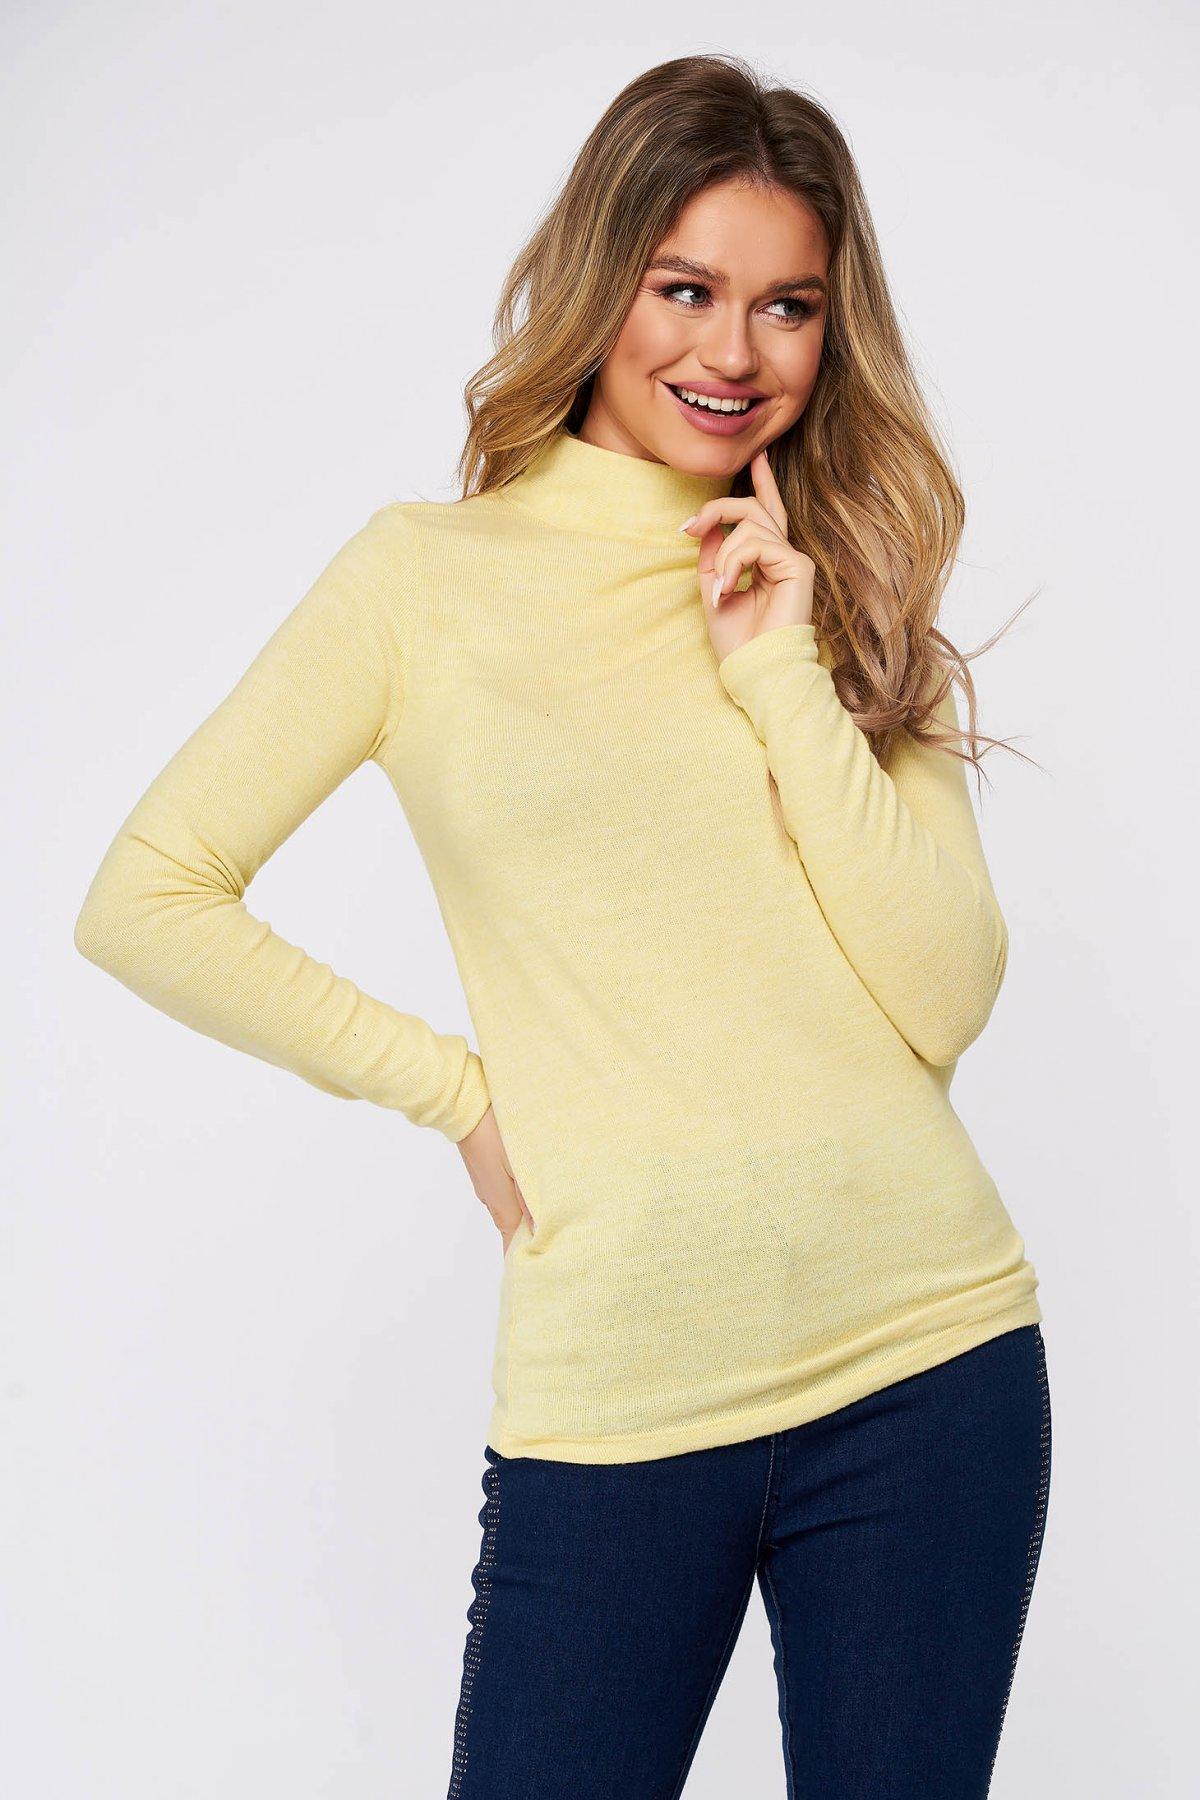 Bluza dama SunShine galbena din bumbac pe gat din material elastic si fin la atingere